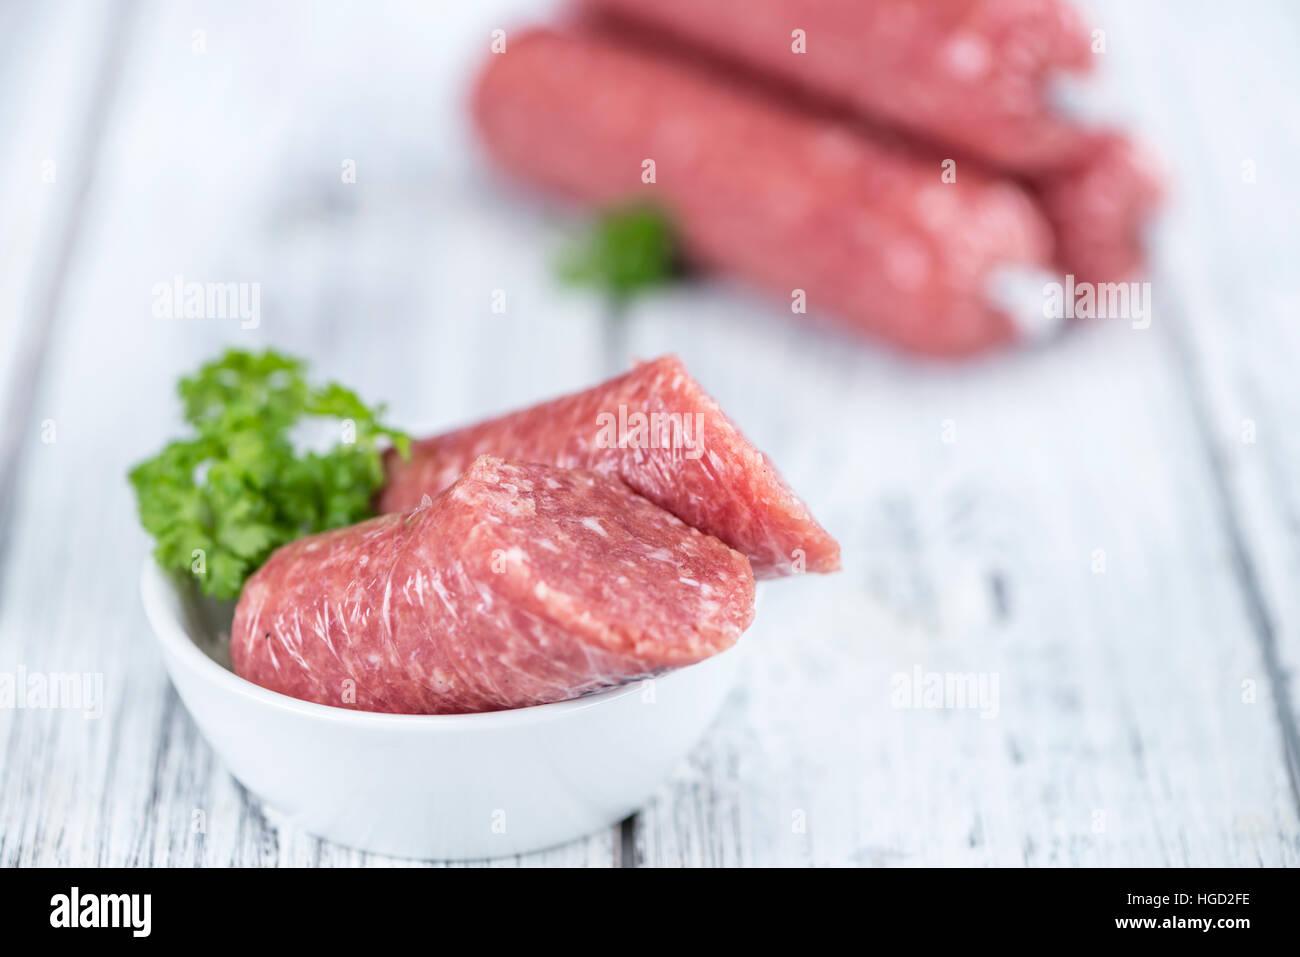 Minced Pork Sausage (German cuisine; selective focus) on wooden background - Stock Image